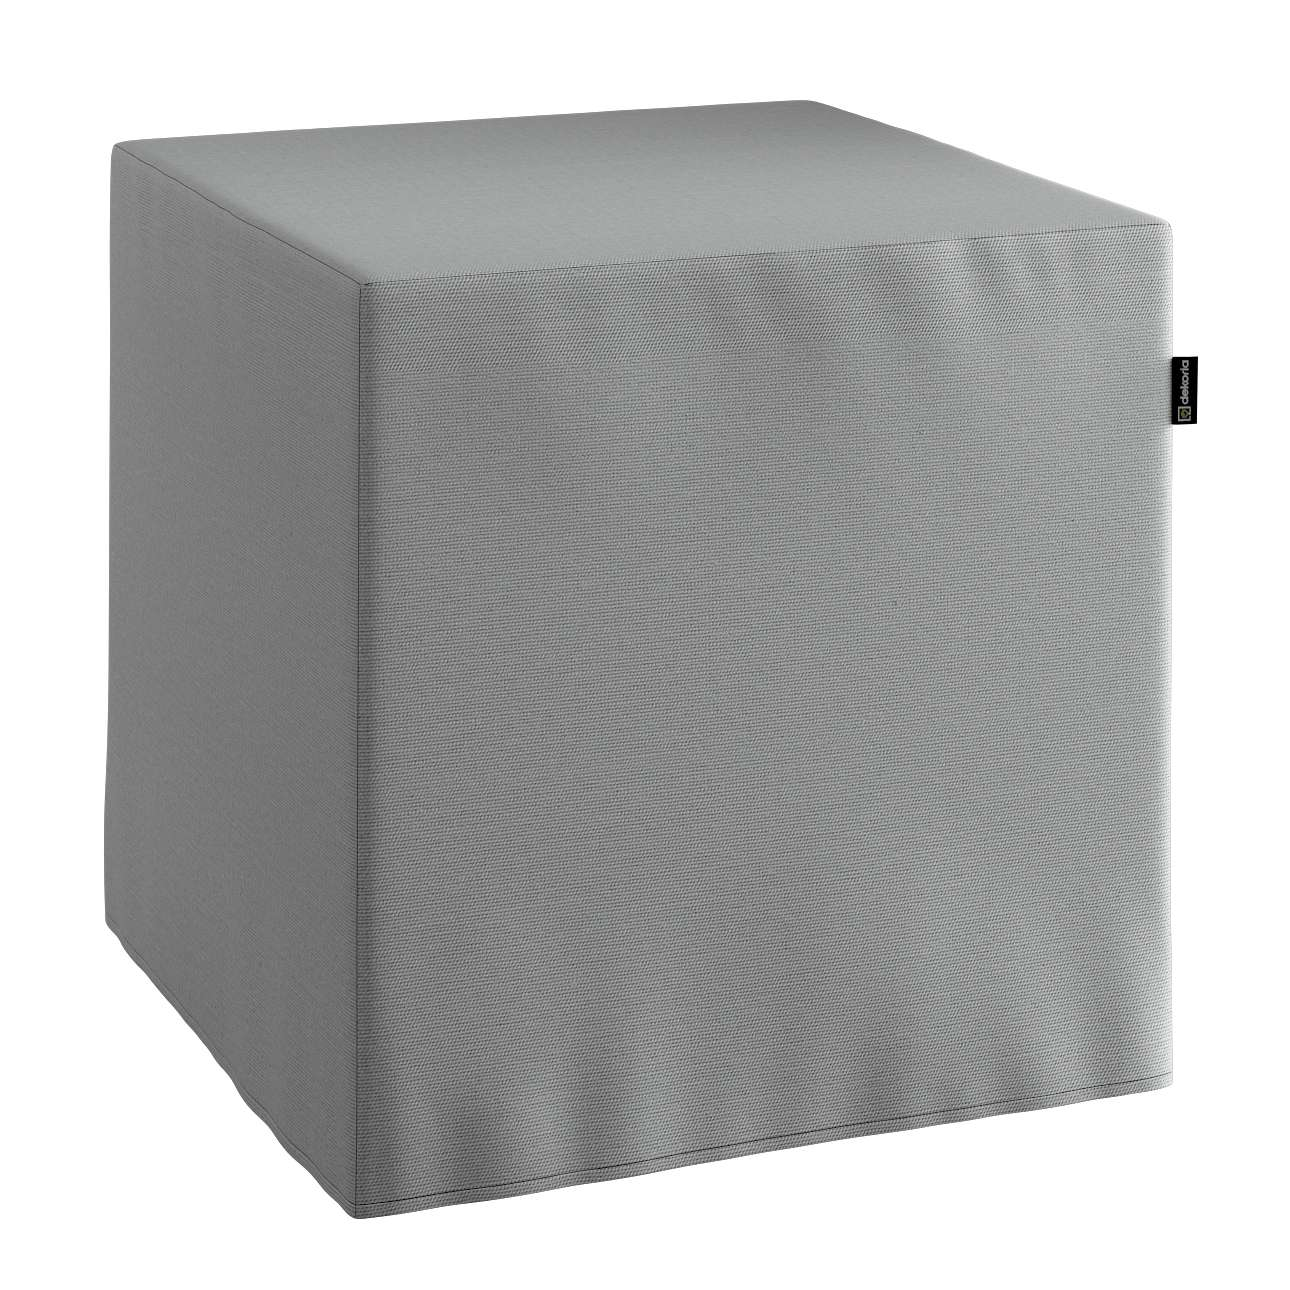 Sedák Cube - kostka pevná 40x40x40 v kolekci Loneta, látka: 133-24